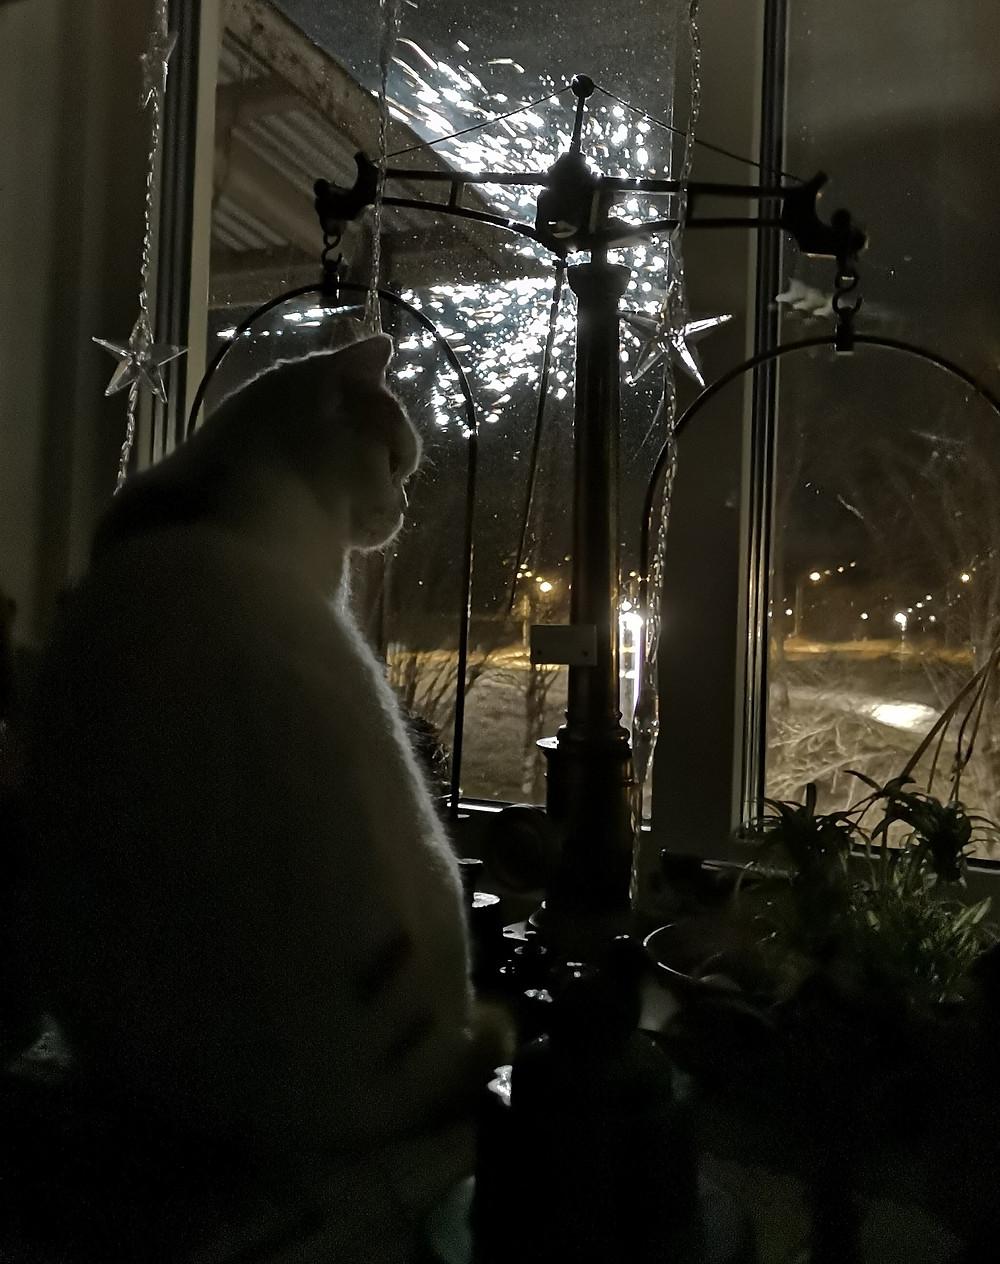 Snuttan Karlsson firar nyår